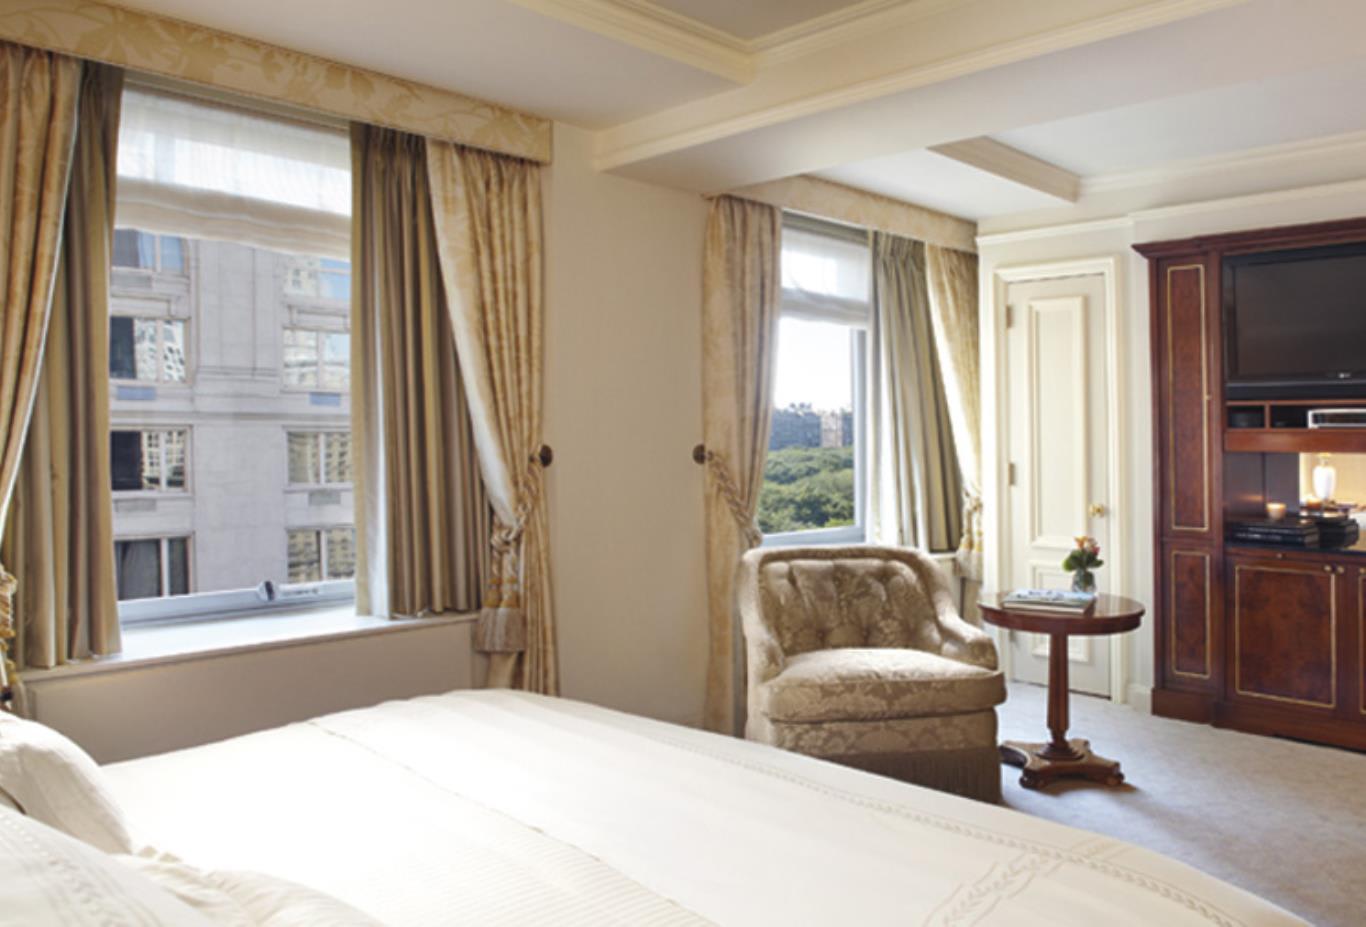 City View Guestroom